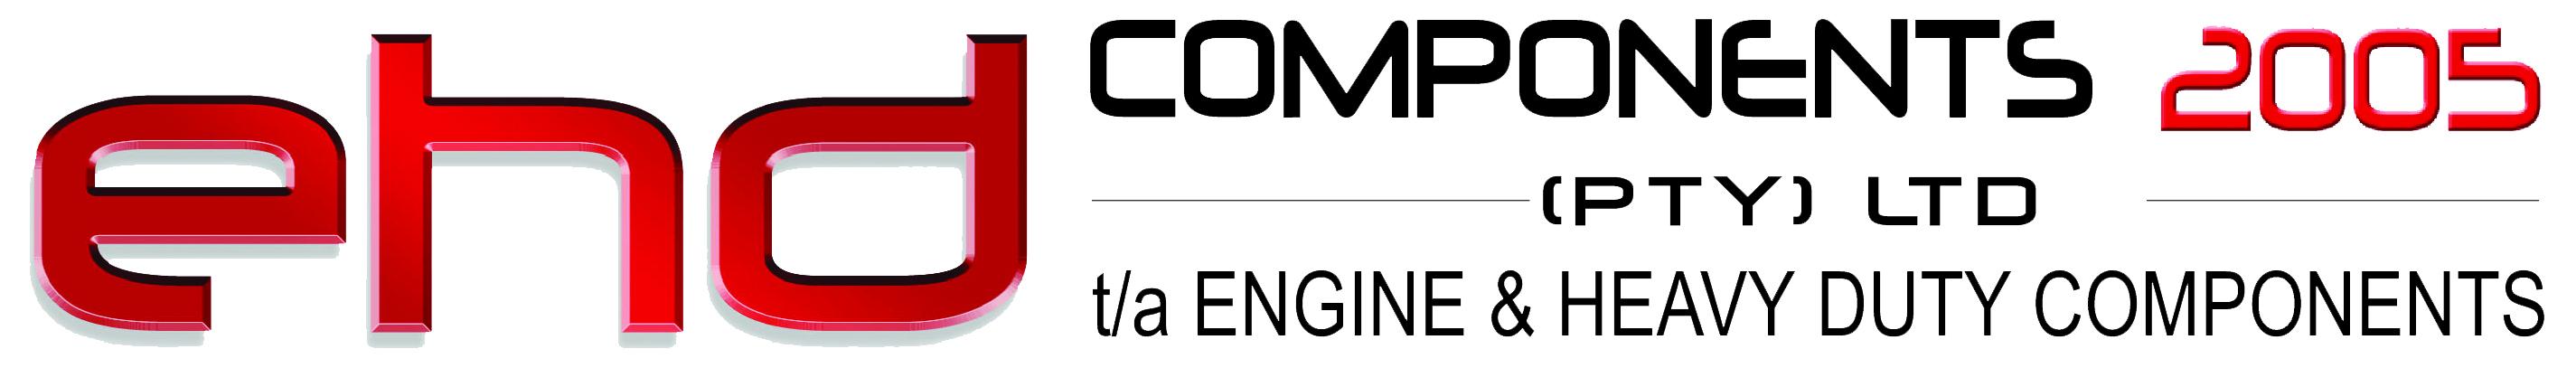 EHD Components 2005 (PTY)LTD